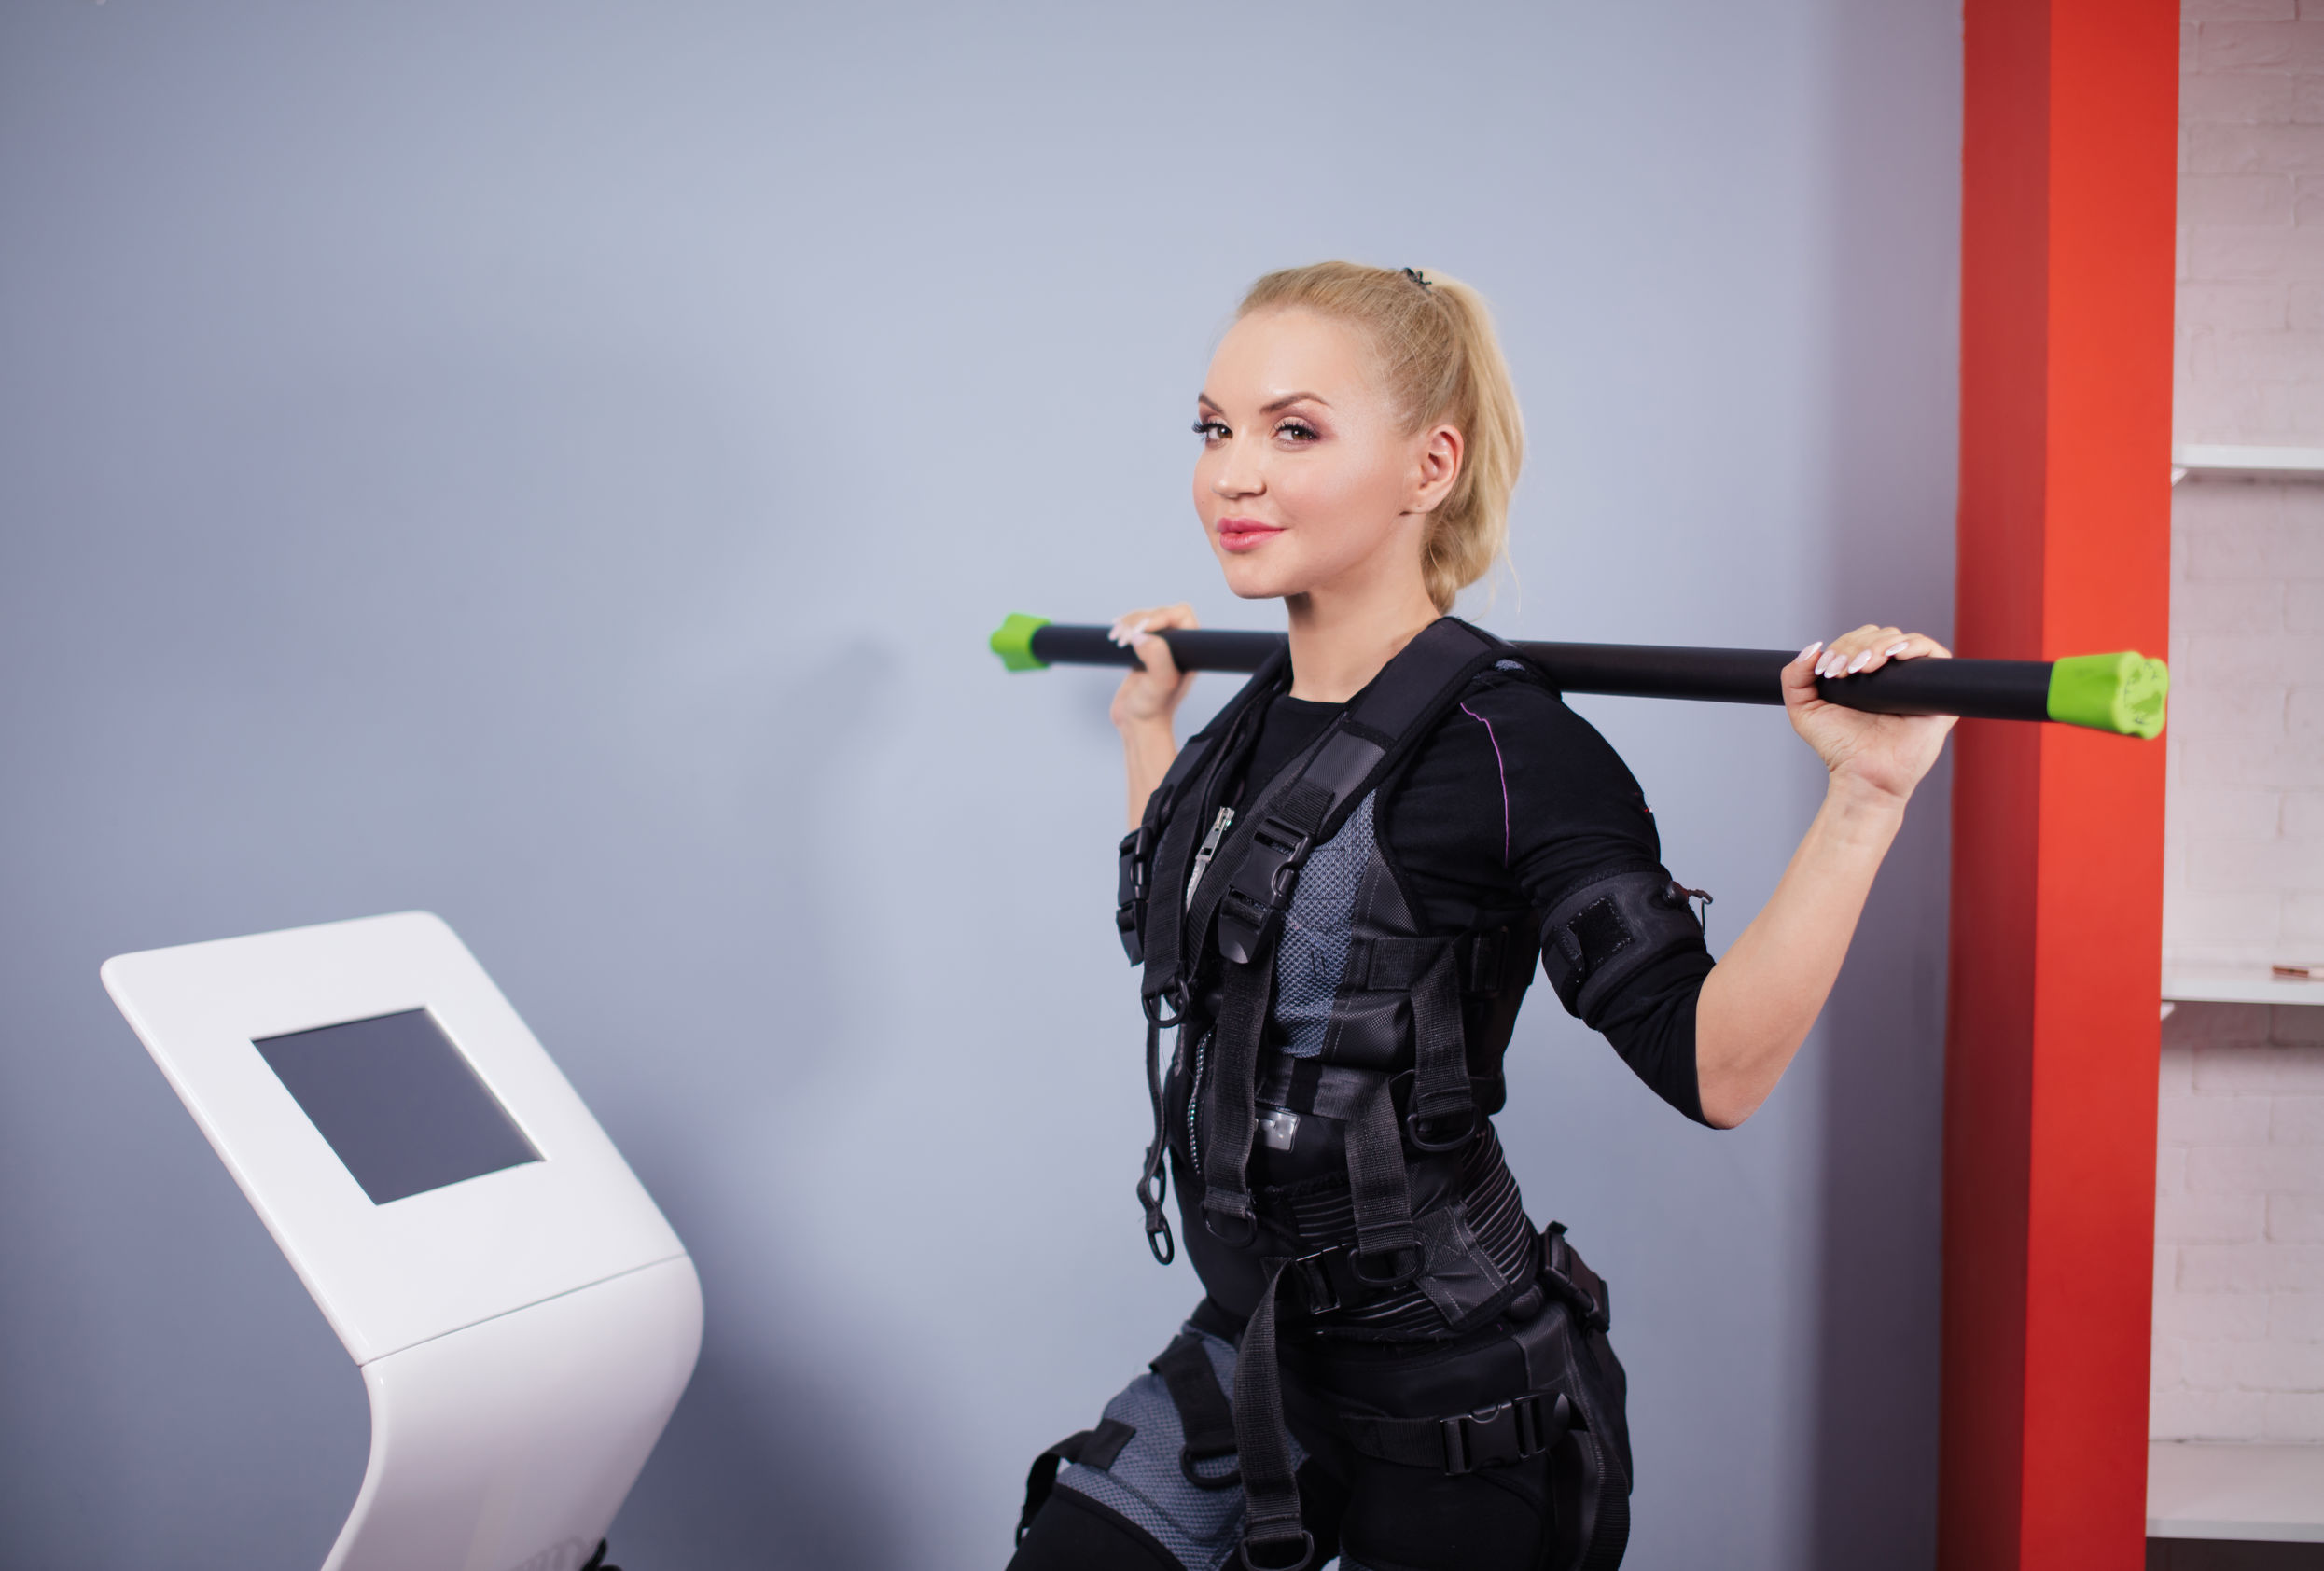 Impresionante mujer deportiva en traje de EMS